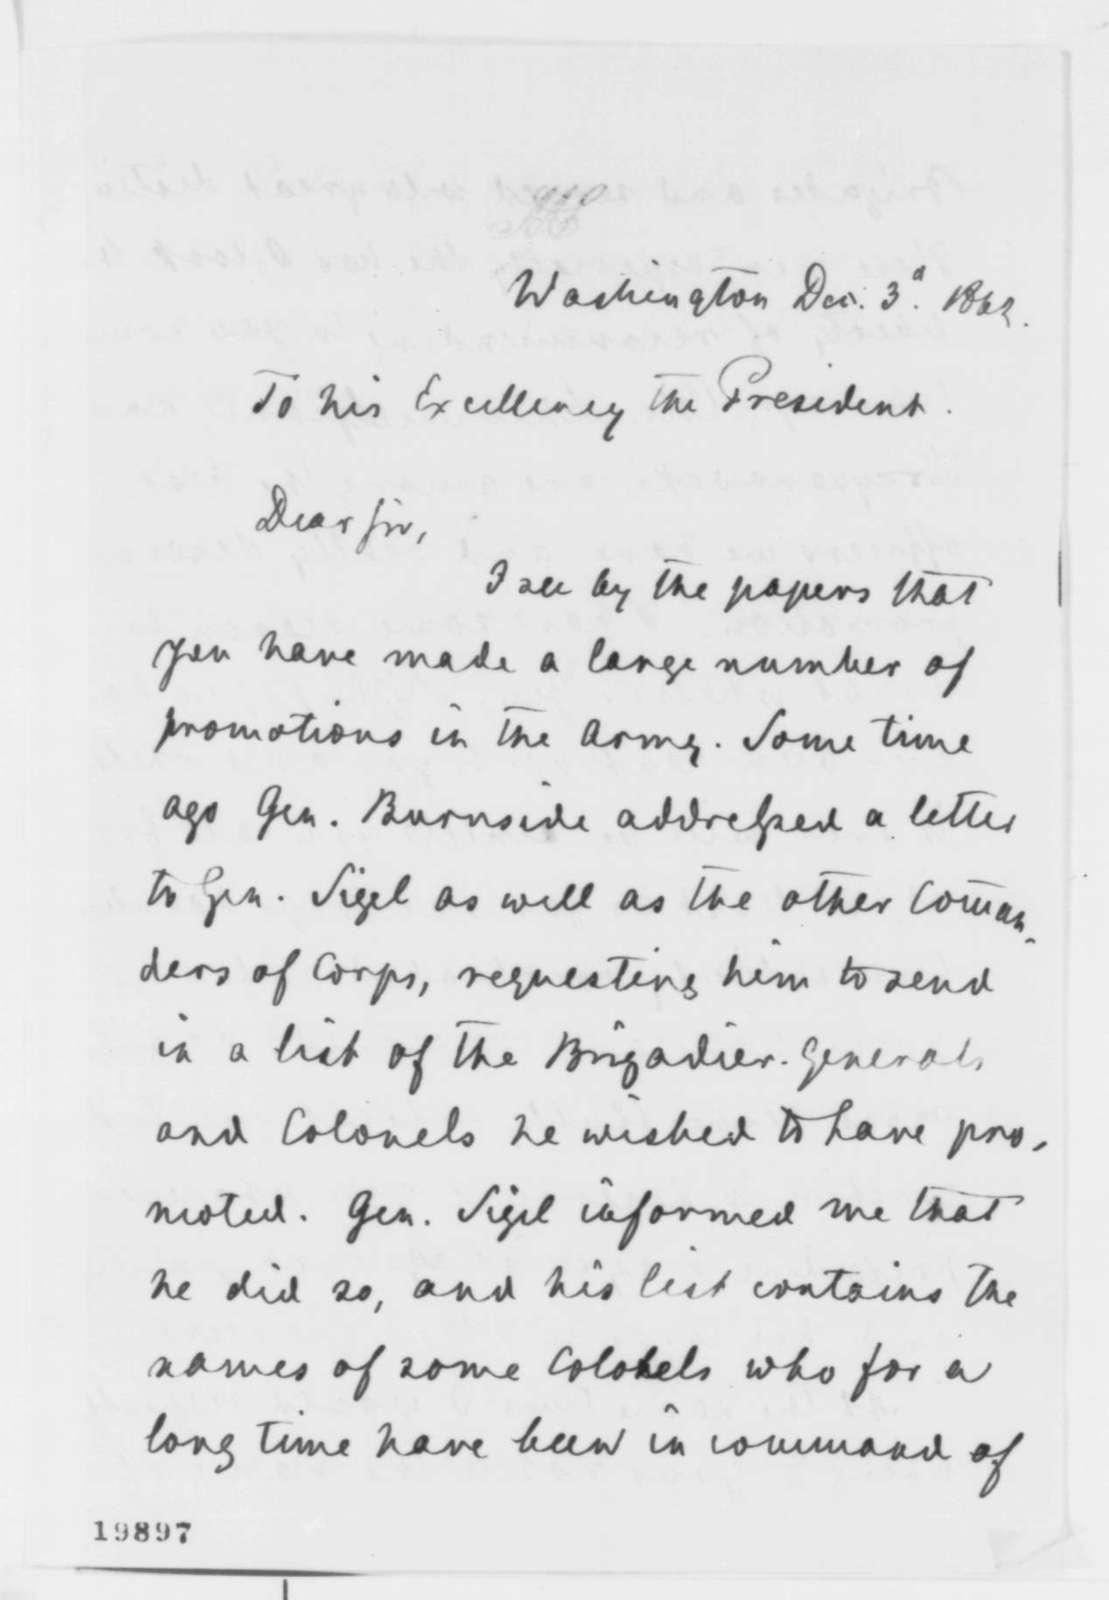 Carl Schurz to Abraham Lincoln, Wednesday, December 03, 1862  (Military affairs)